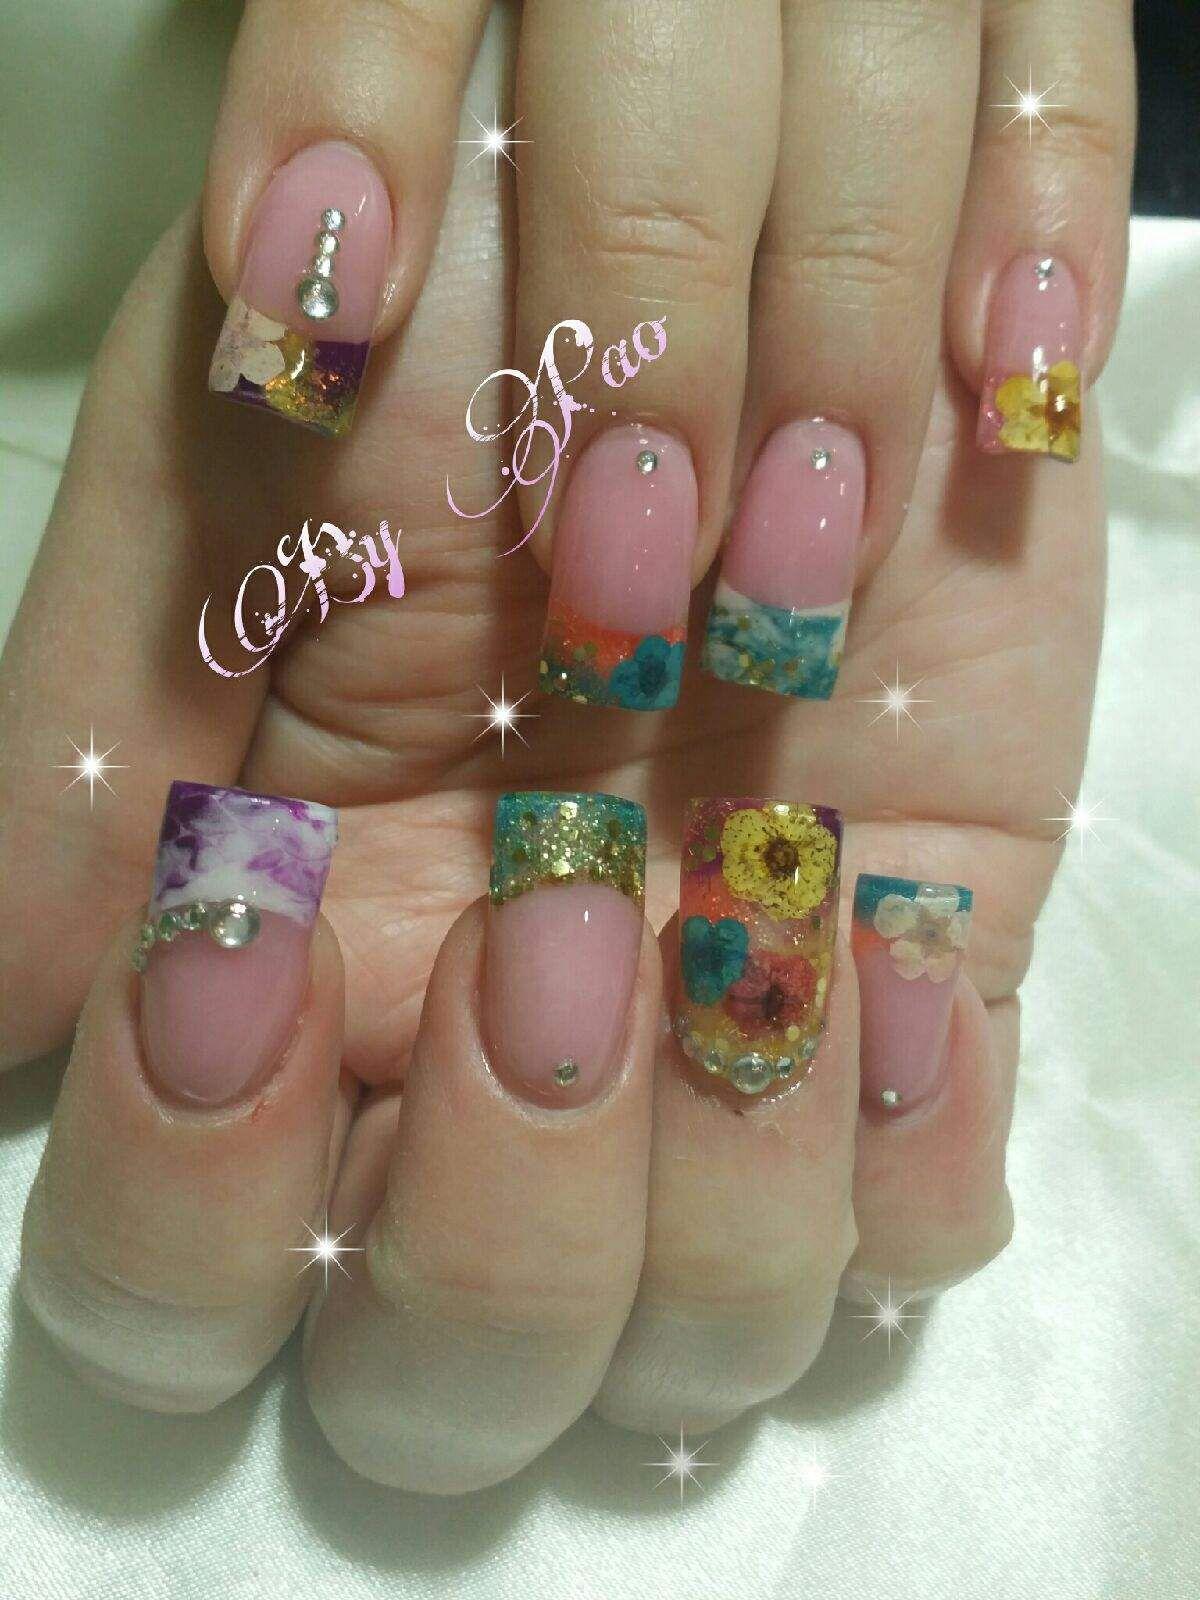 Encapsulated nails | Nails | Pinterest | Arte de uñas, Diseños de ...